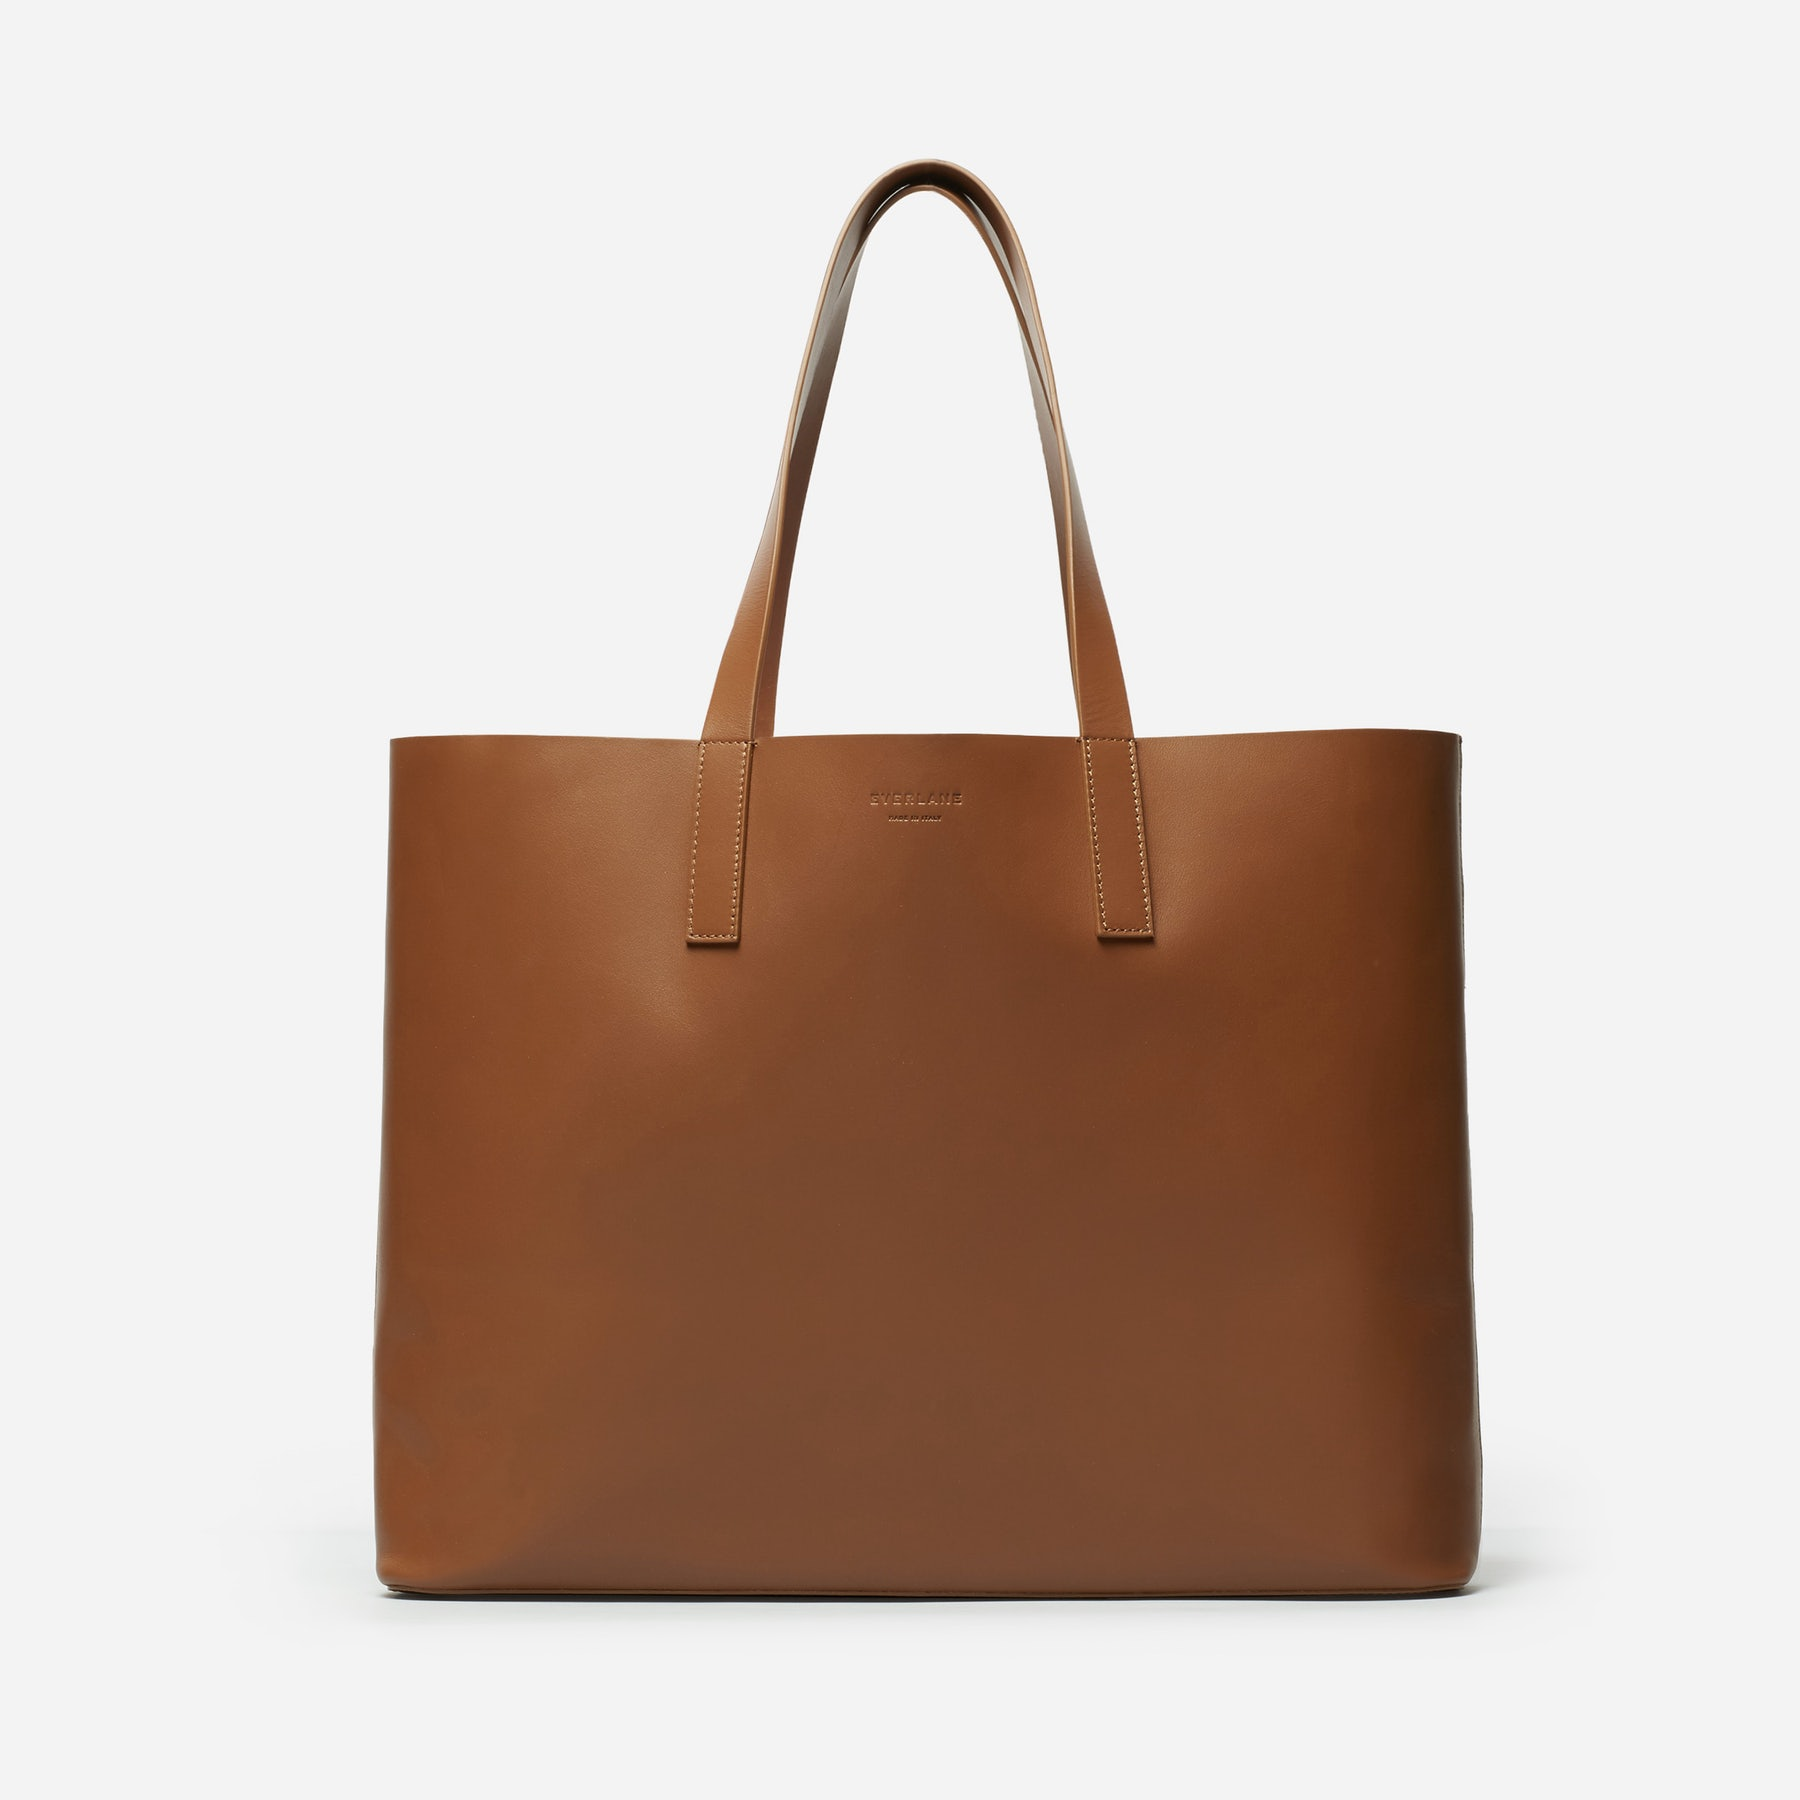 everlance-bag.jpg